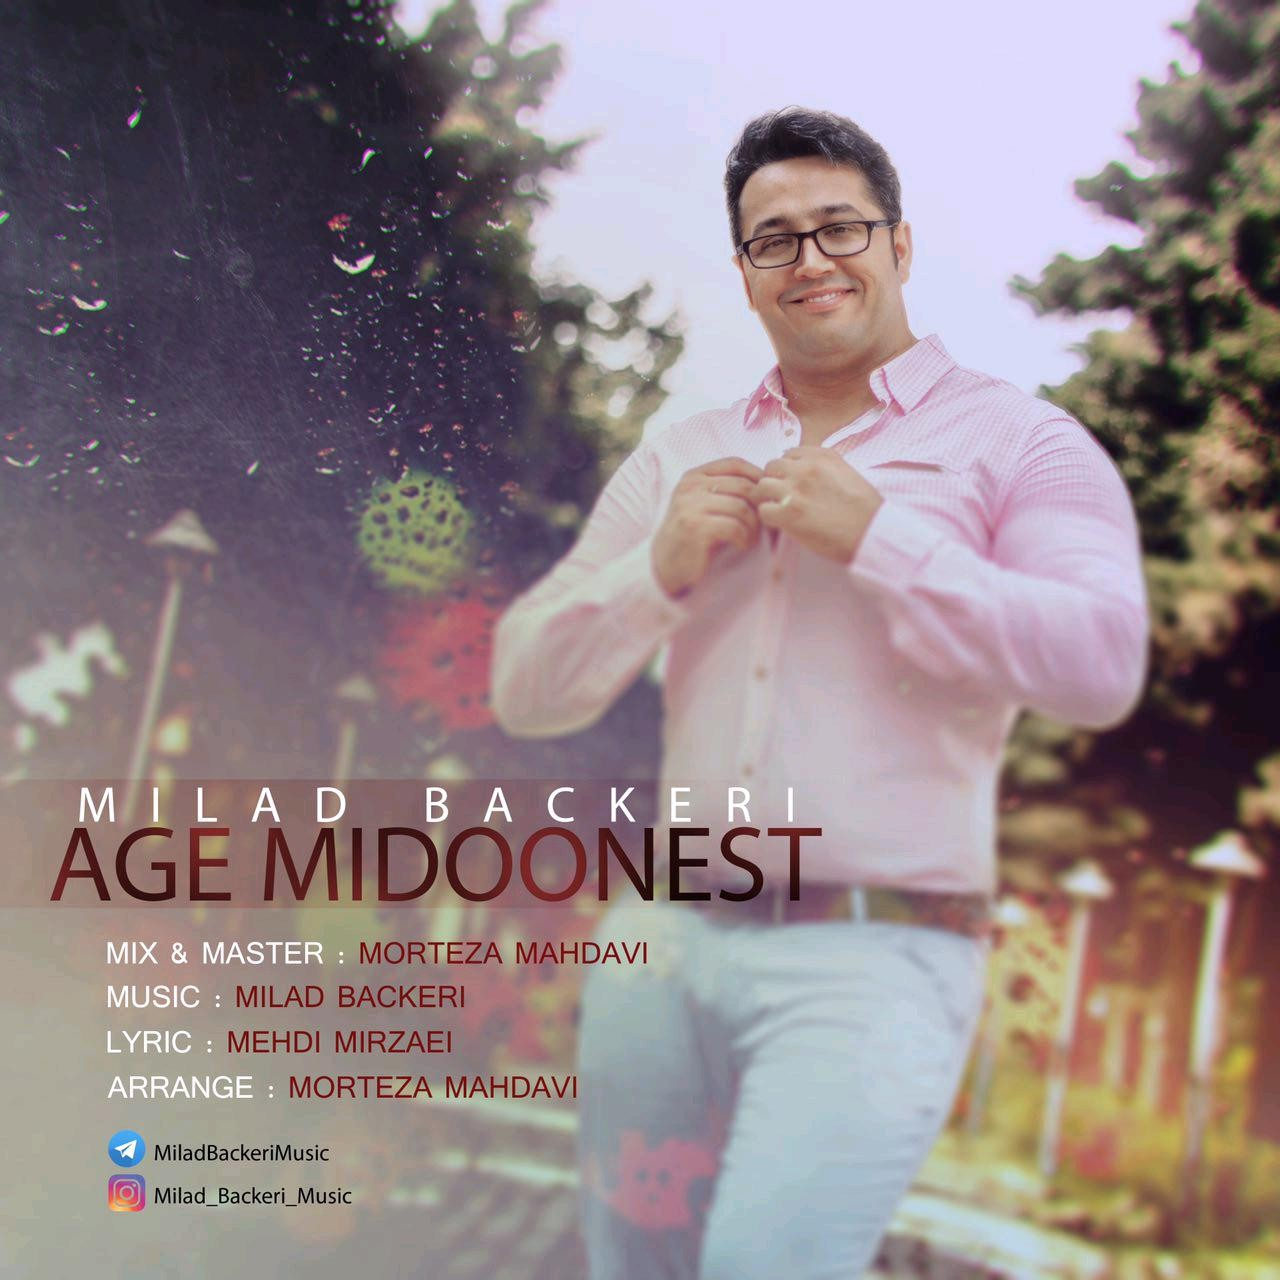 Milad Backeri – Age Midoonest